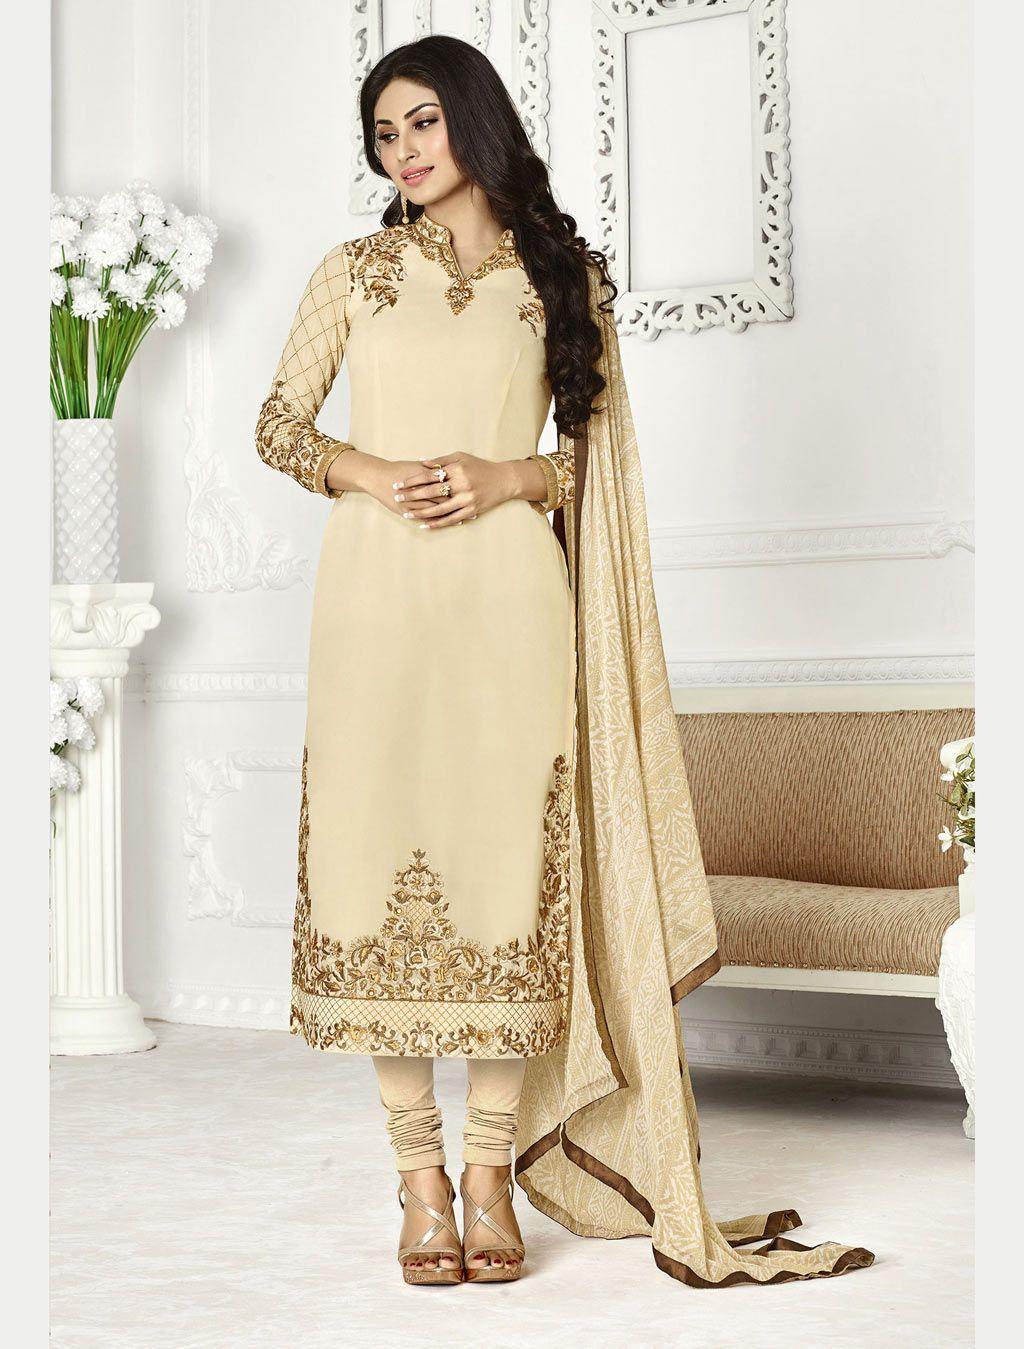 Mouni roy cream georgette churidar suit indian wear